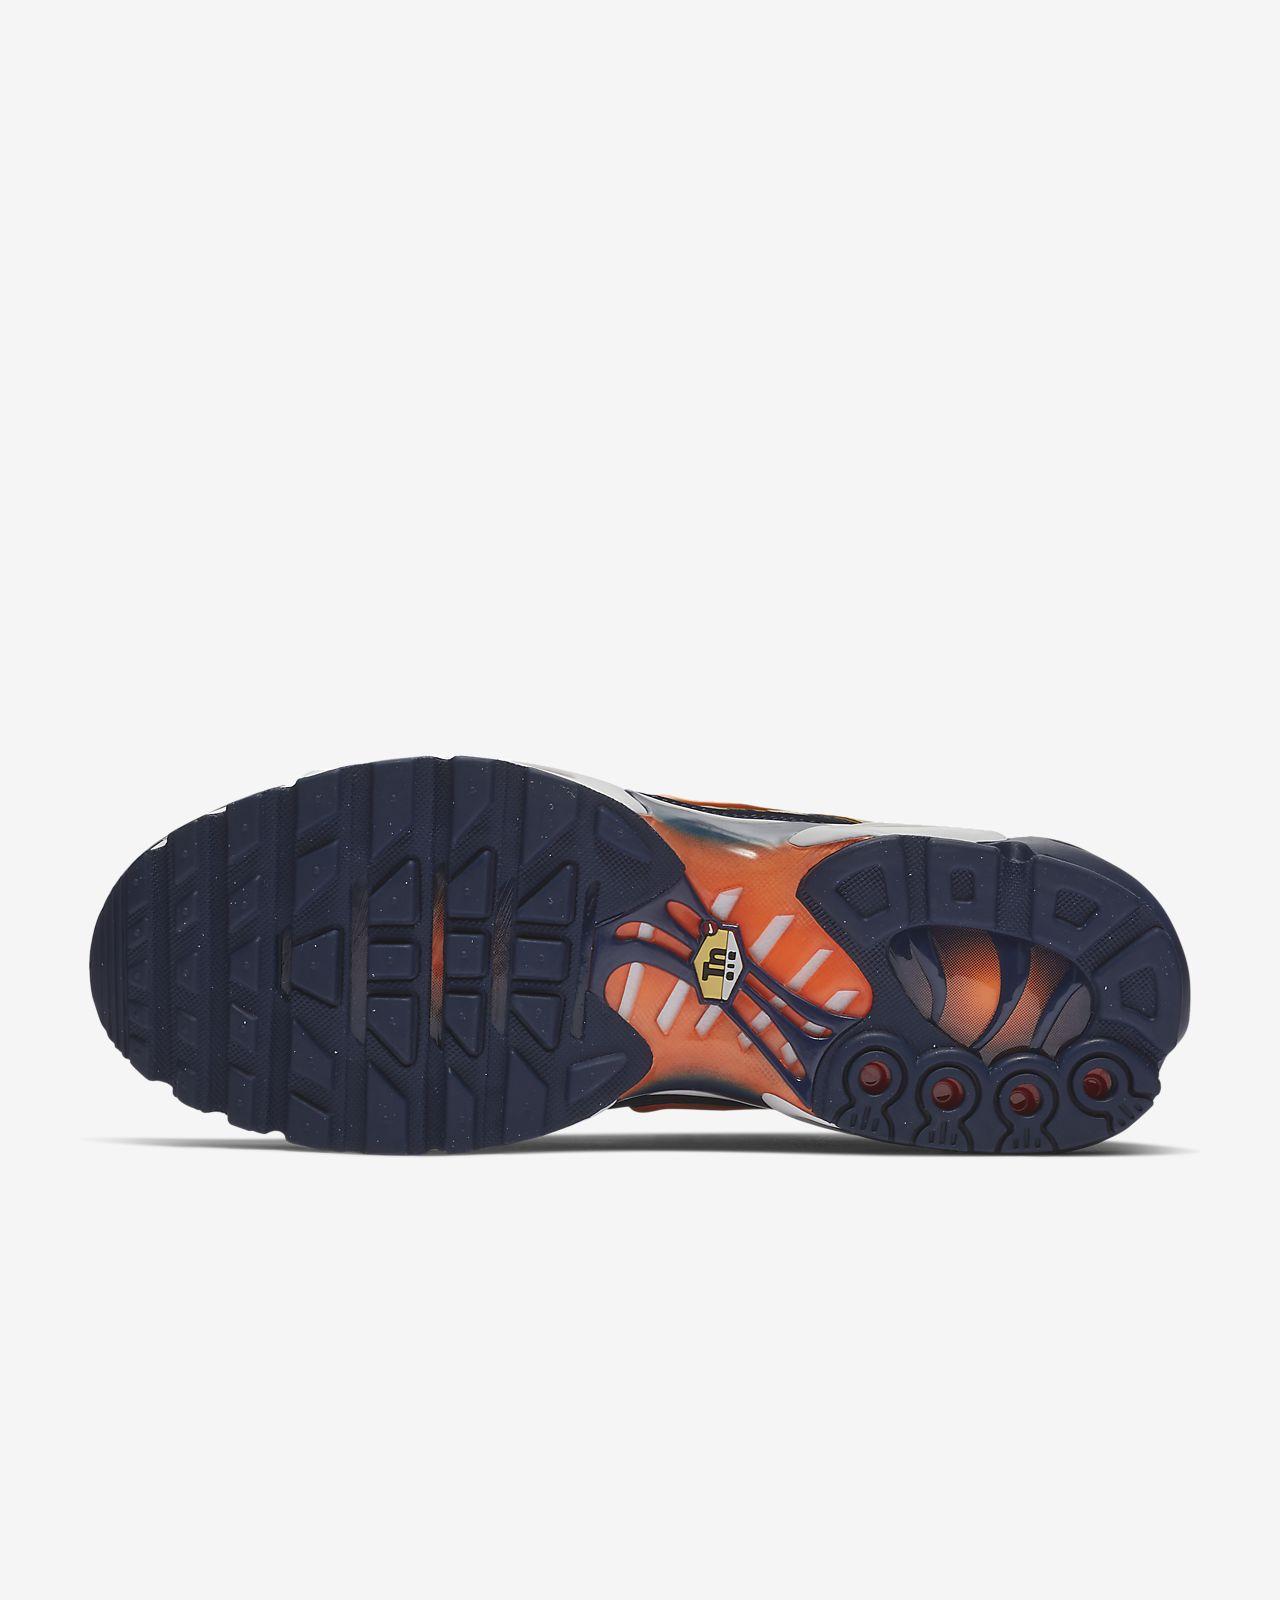 d6c2dce2e3672a Nike Air Max Plus Men s Shoe. Nike.com GB